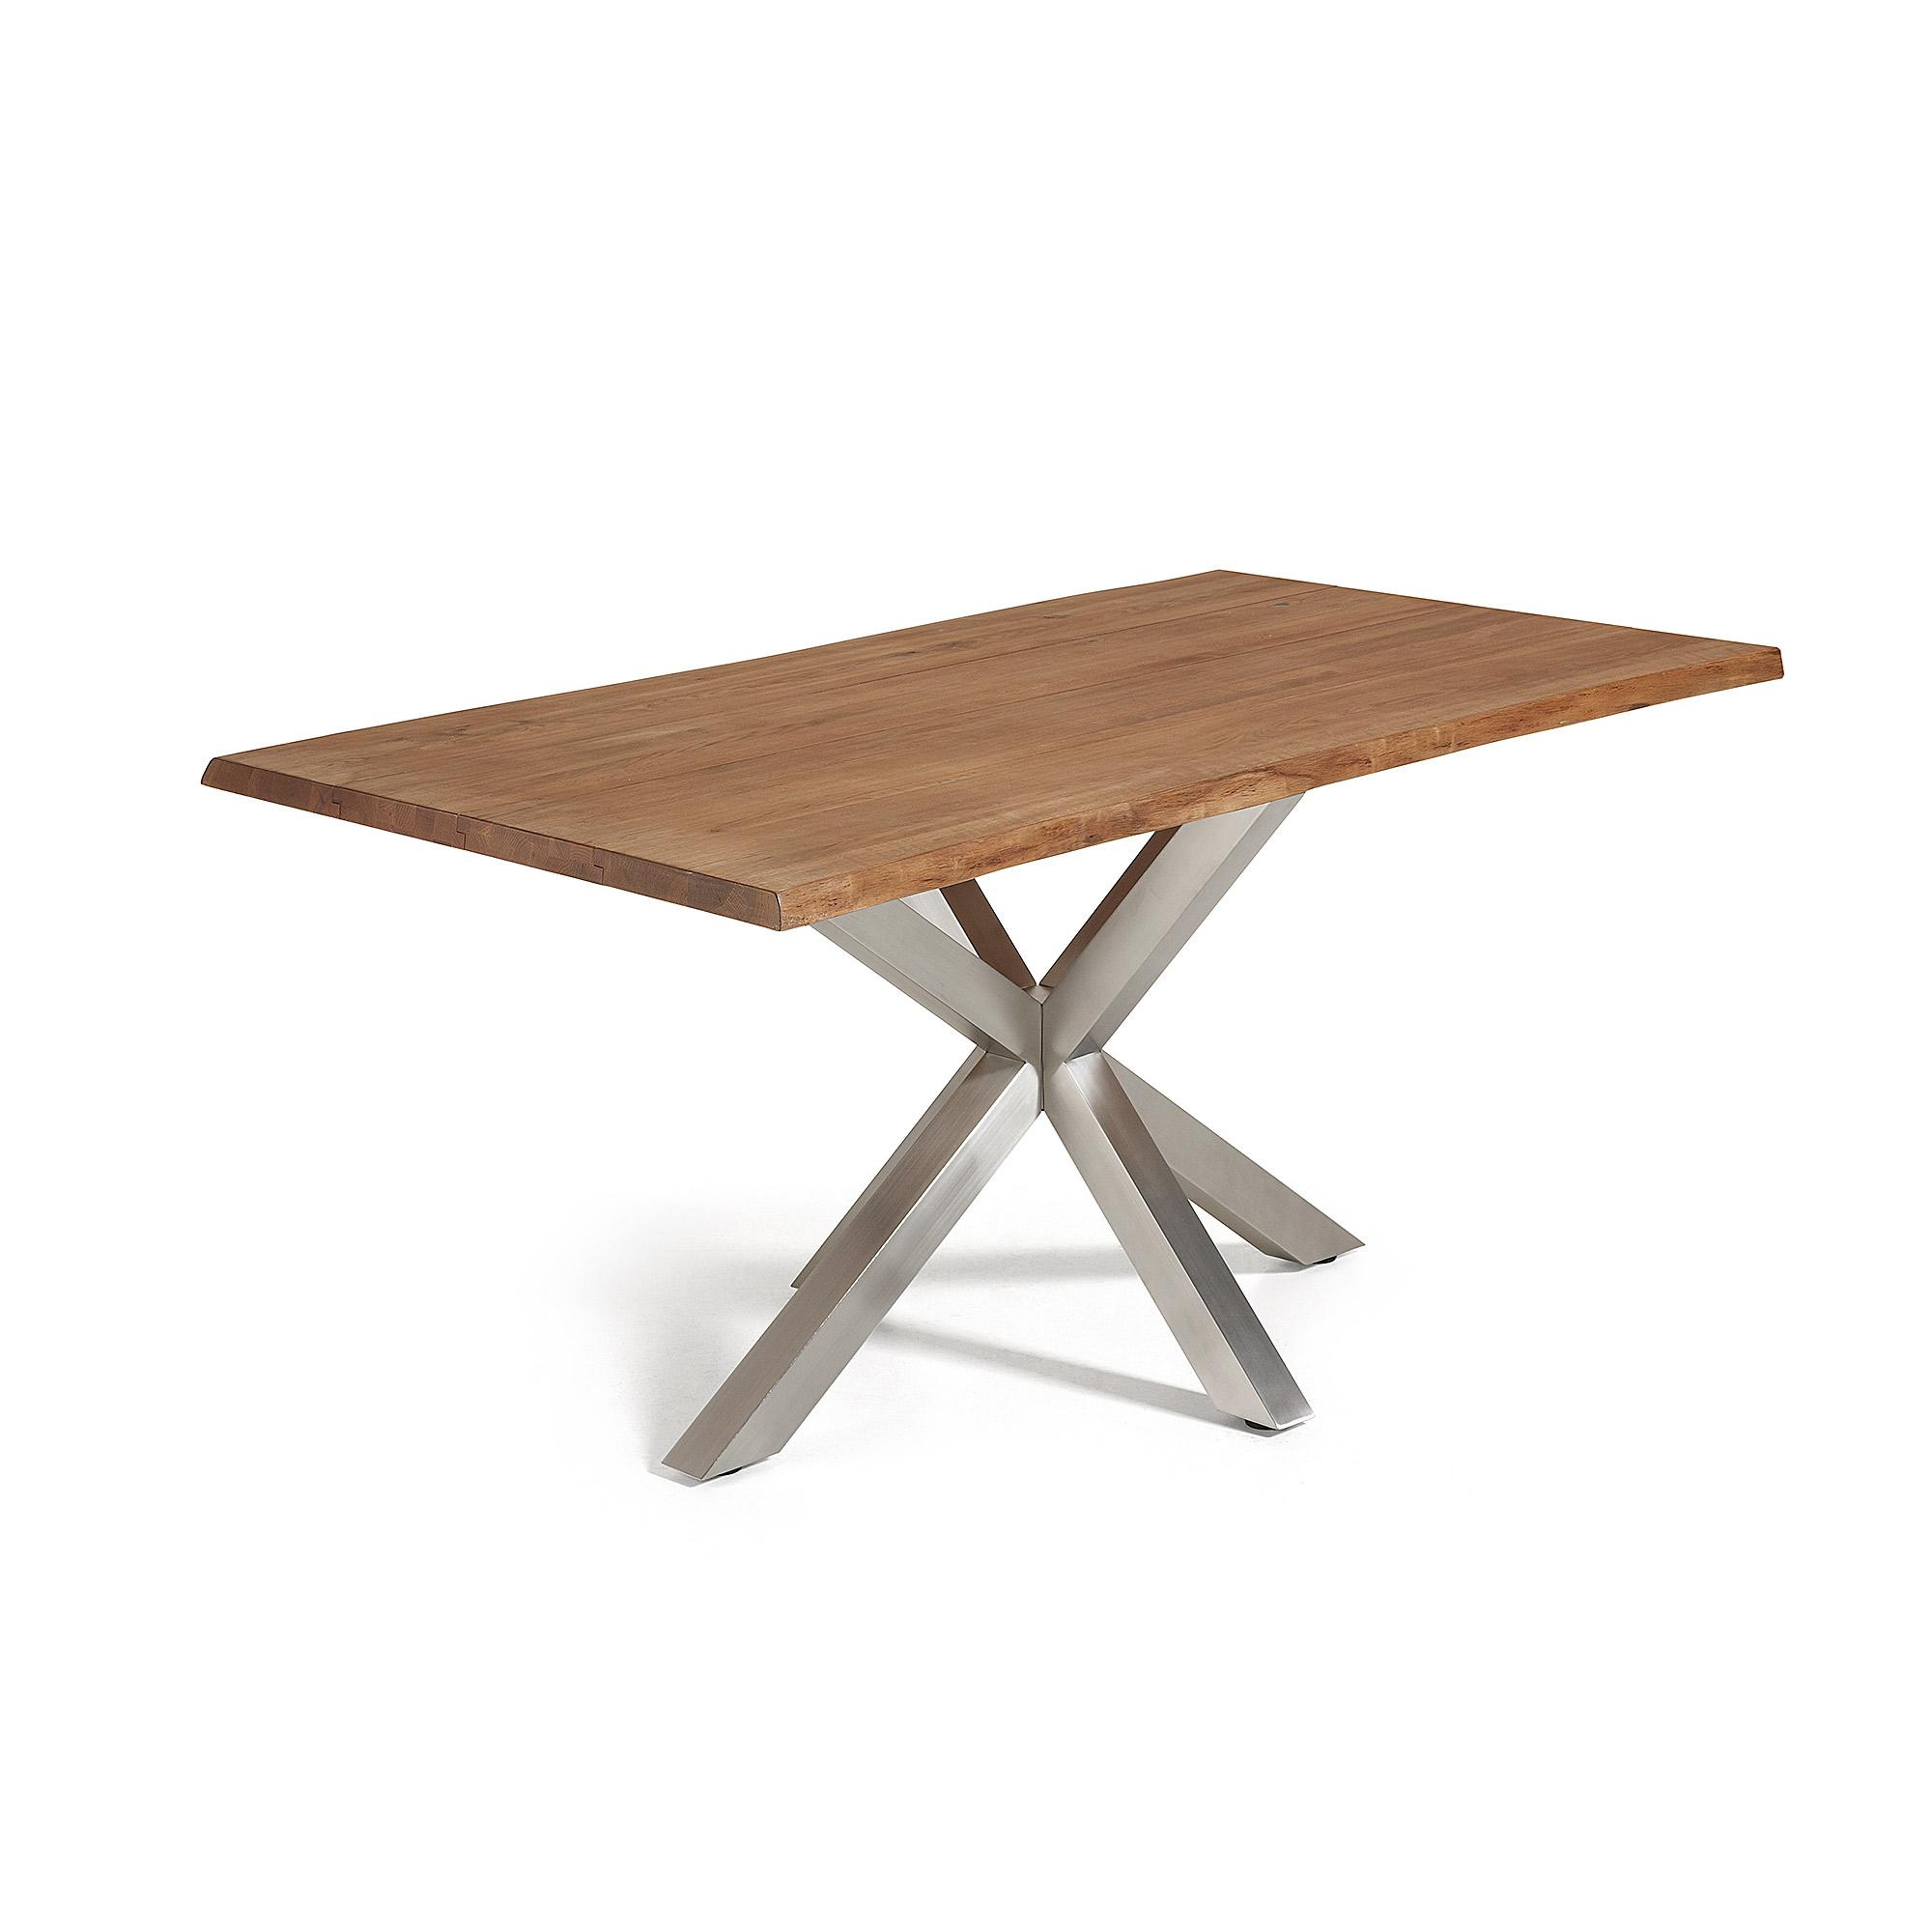 laforma – Laforma arya spisebord - natur/sølv træ/stål, rektangulær (180x100) fra boboonline.dk